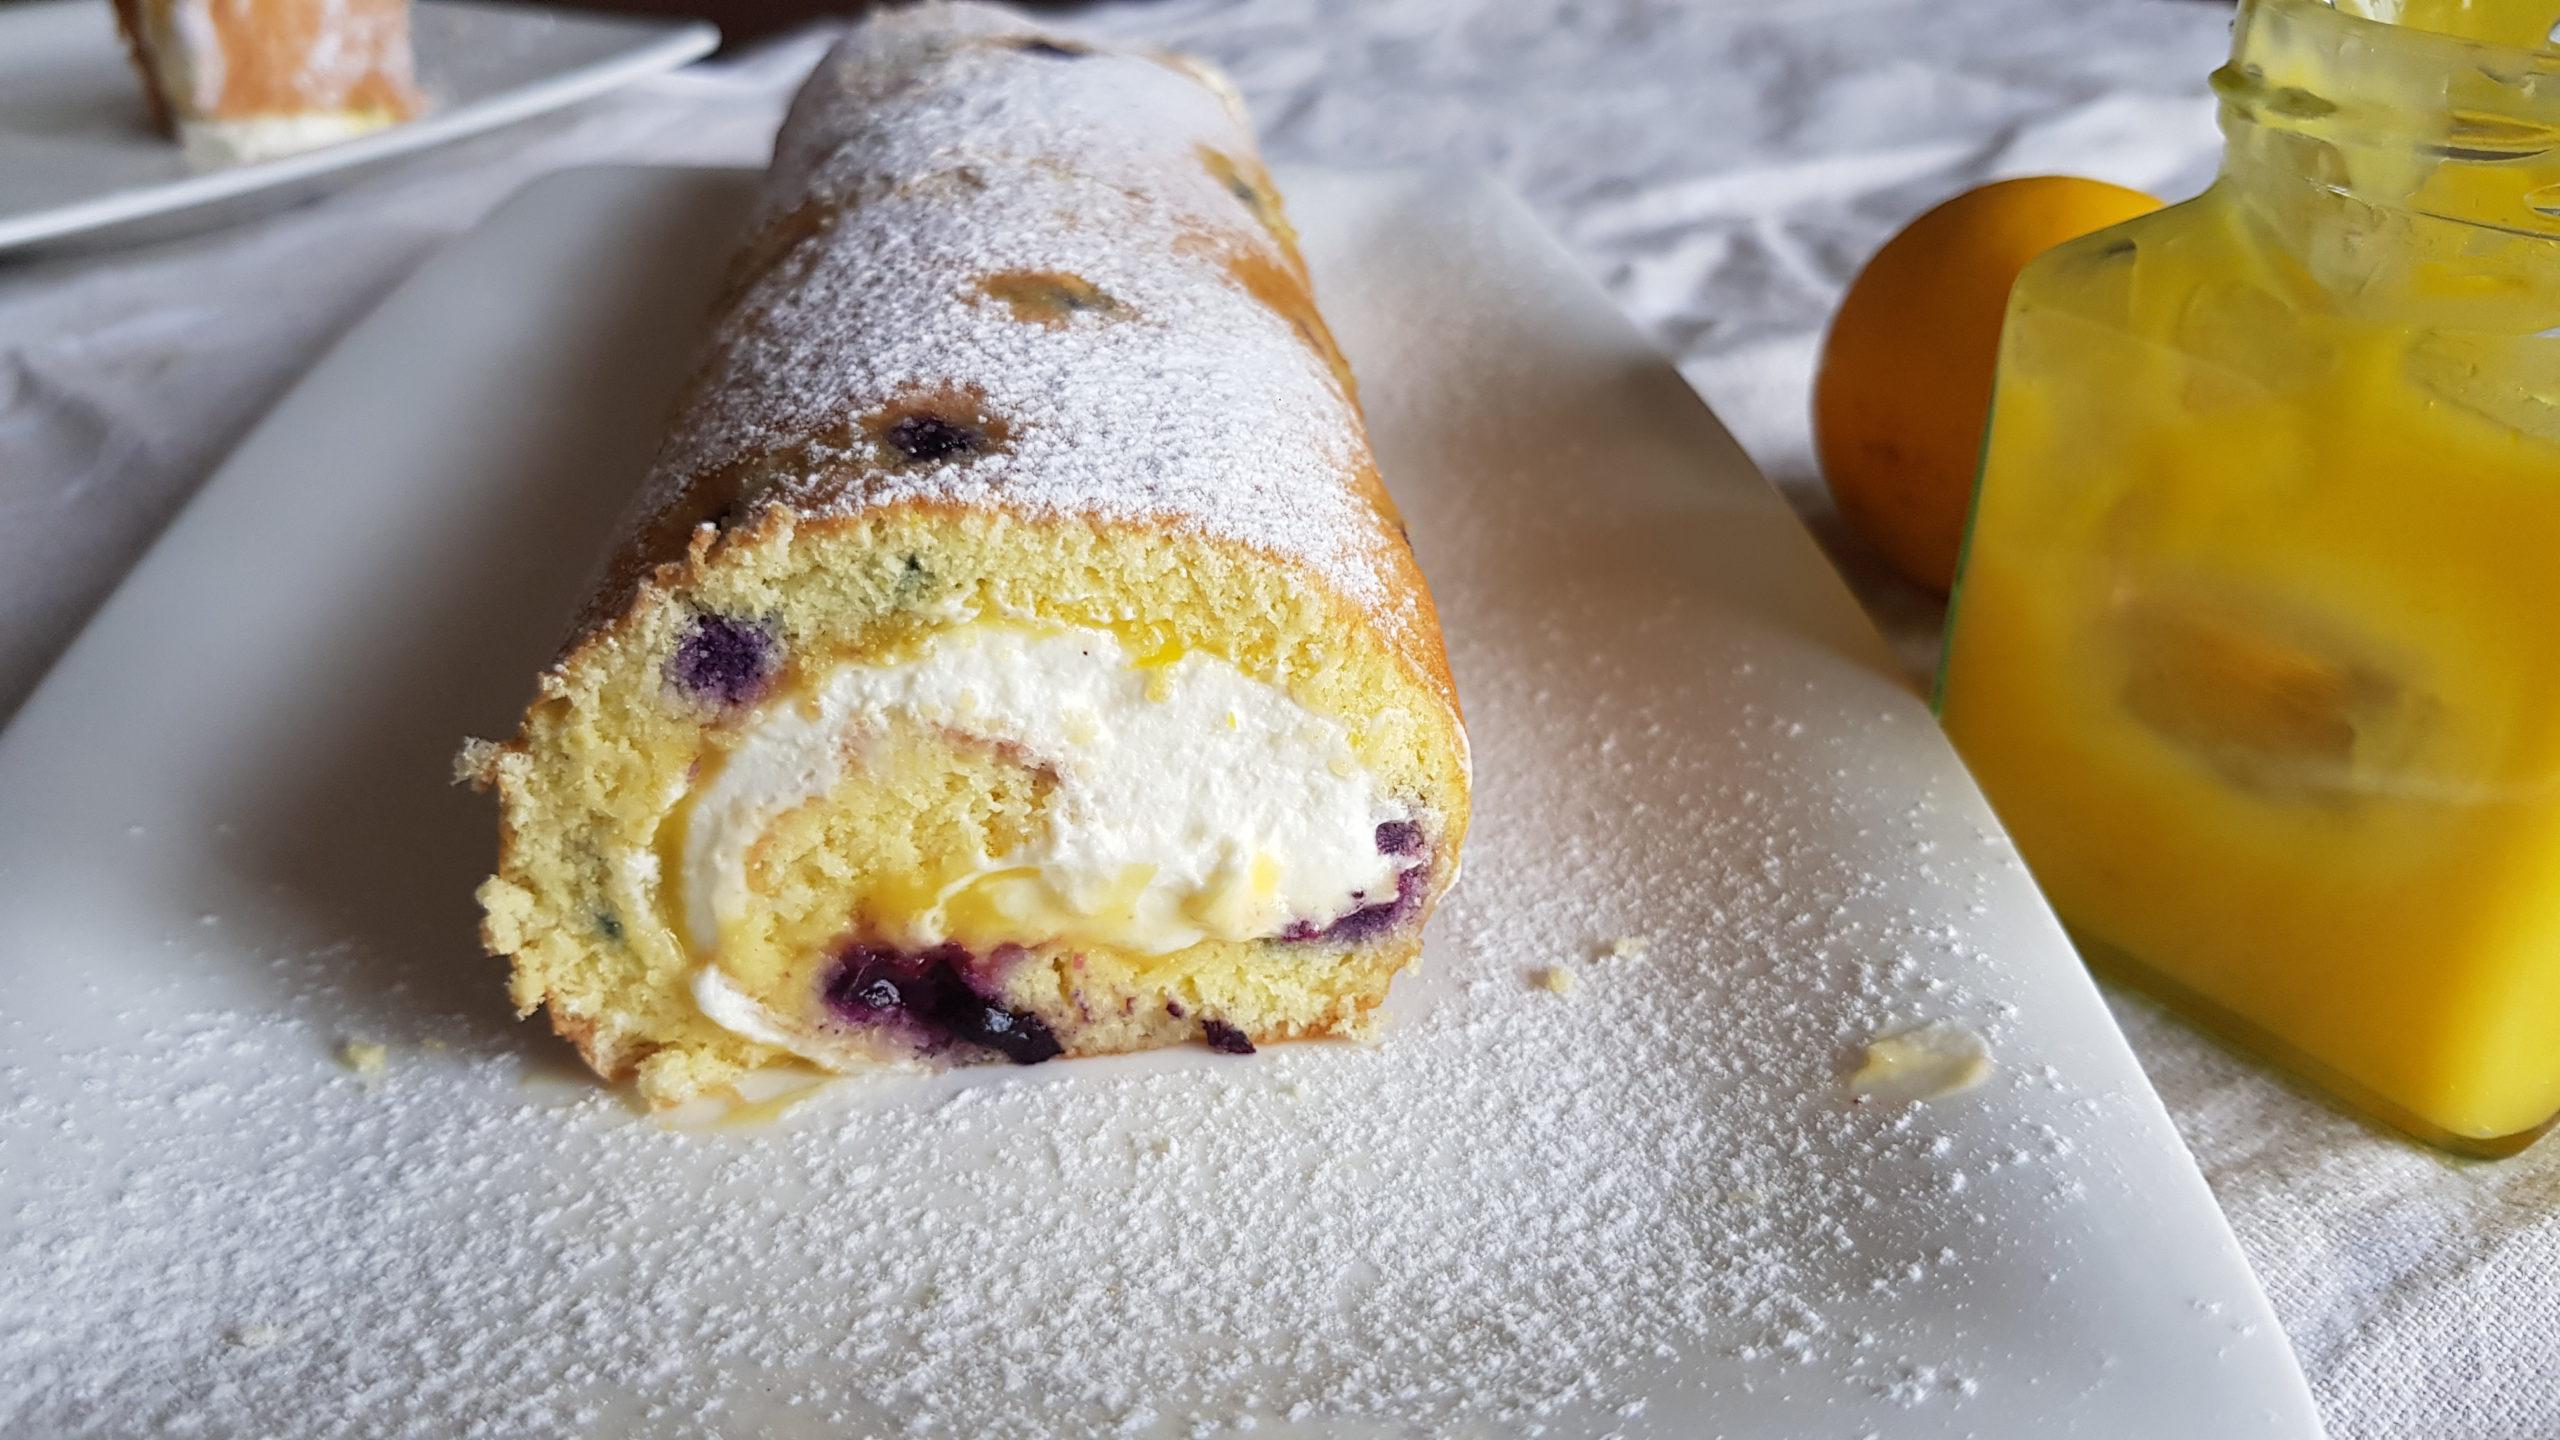 Blueberry & Lemon Swiss Roll